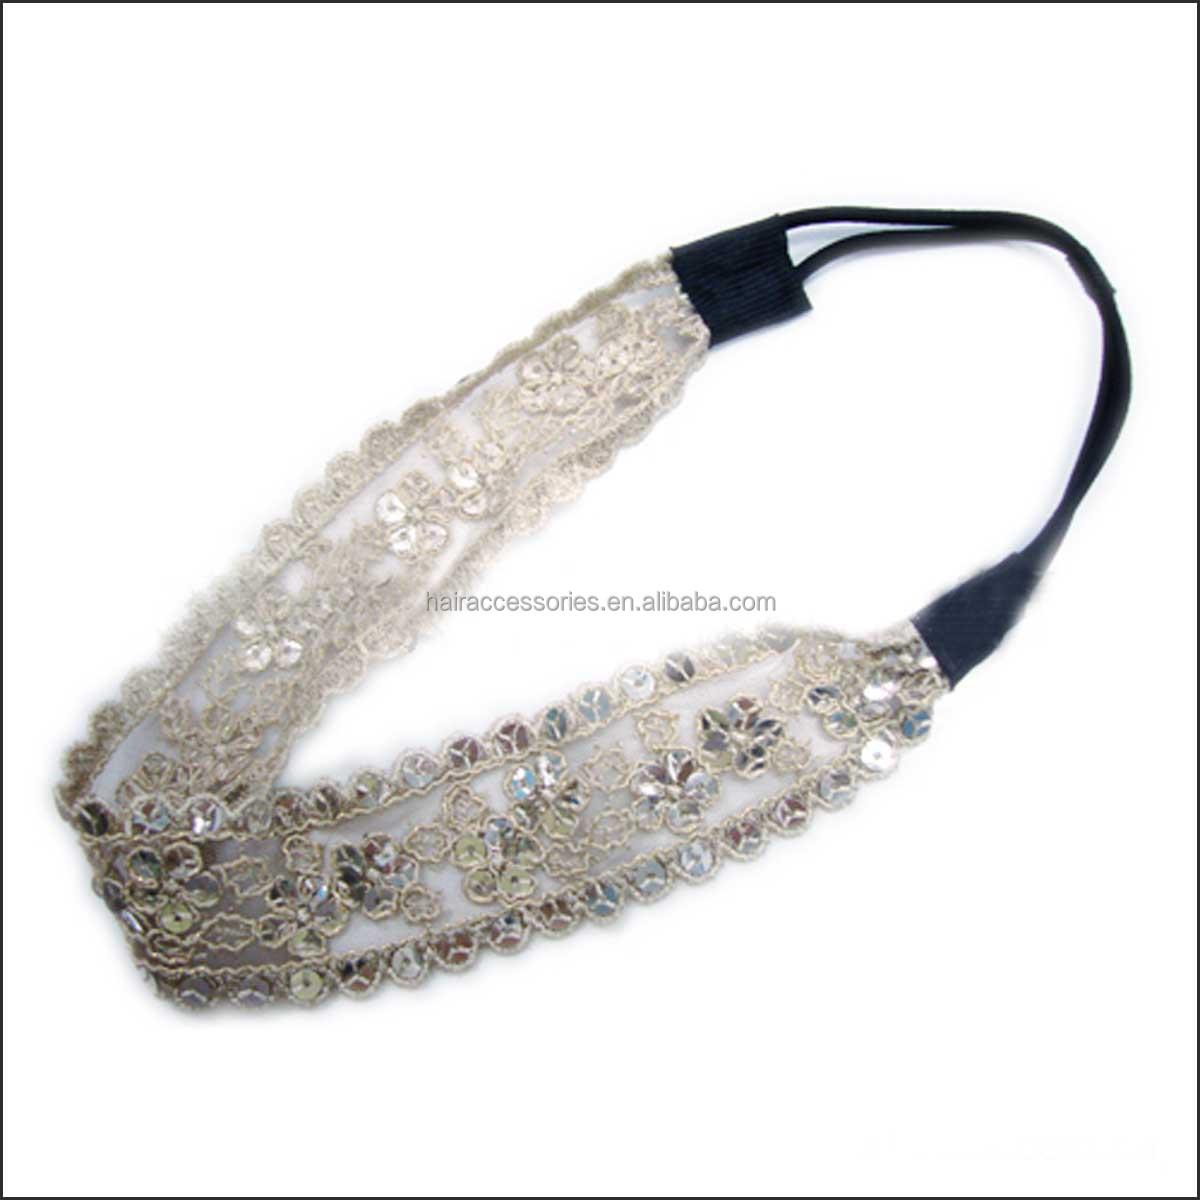 Hair accessories manufacturers - Names Hair Accessories Names Hair Accessories Suppliers And Manufacturers At Alibaba Com